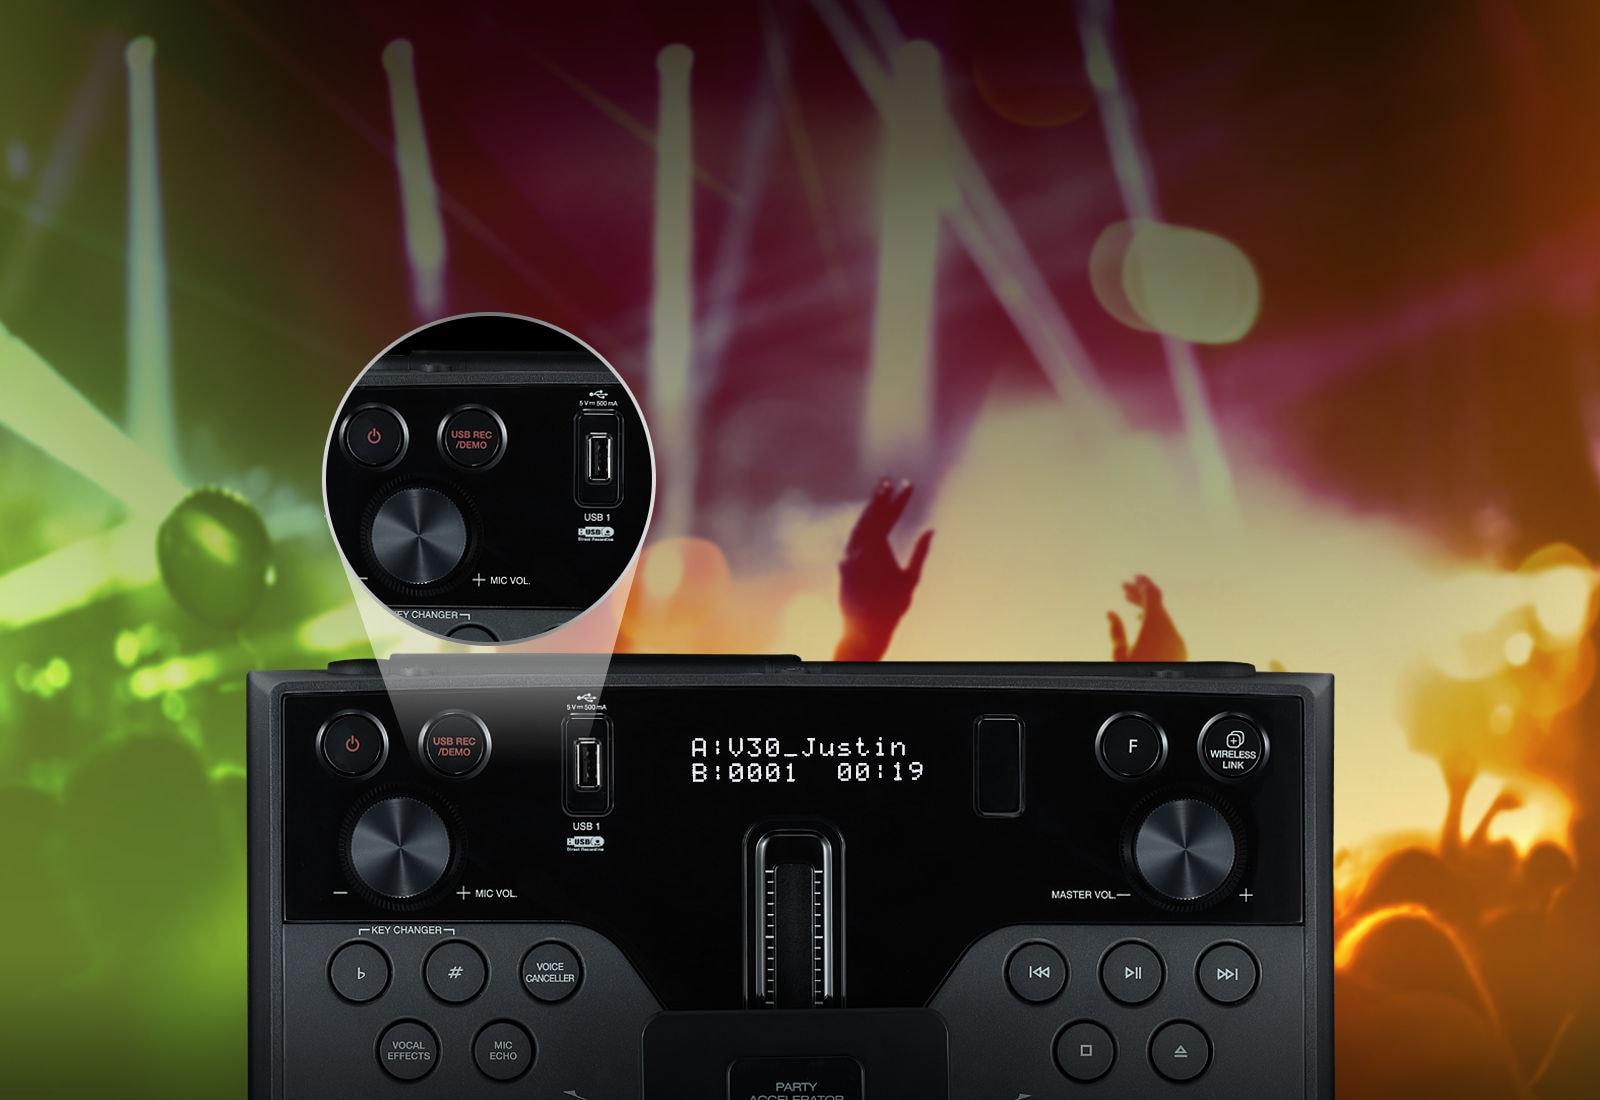 USB แบบคู่ ด้วย DJ Sharing